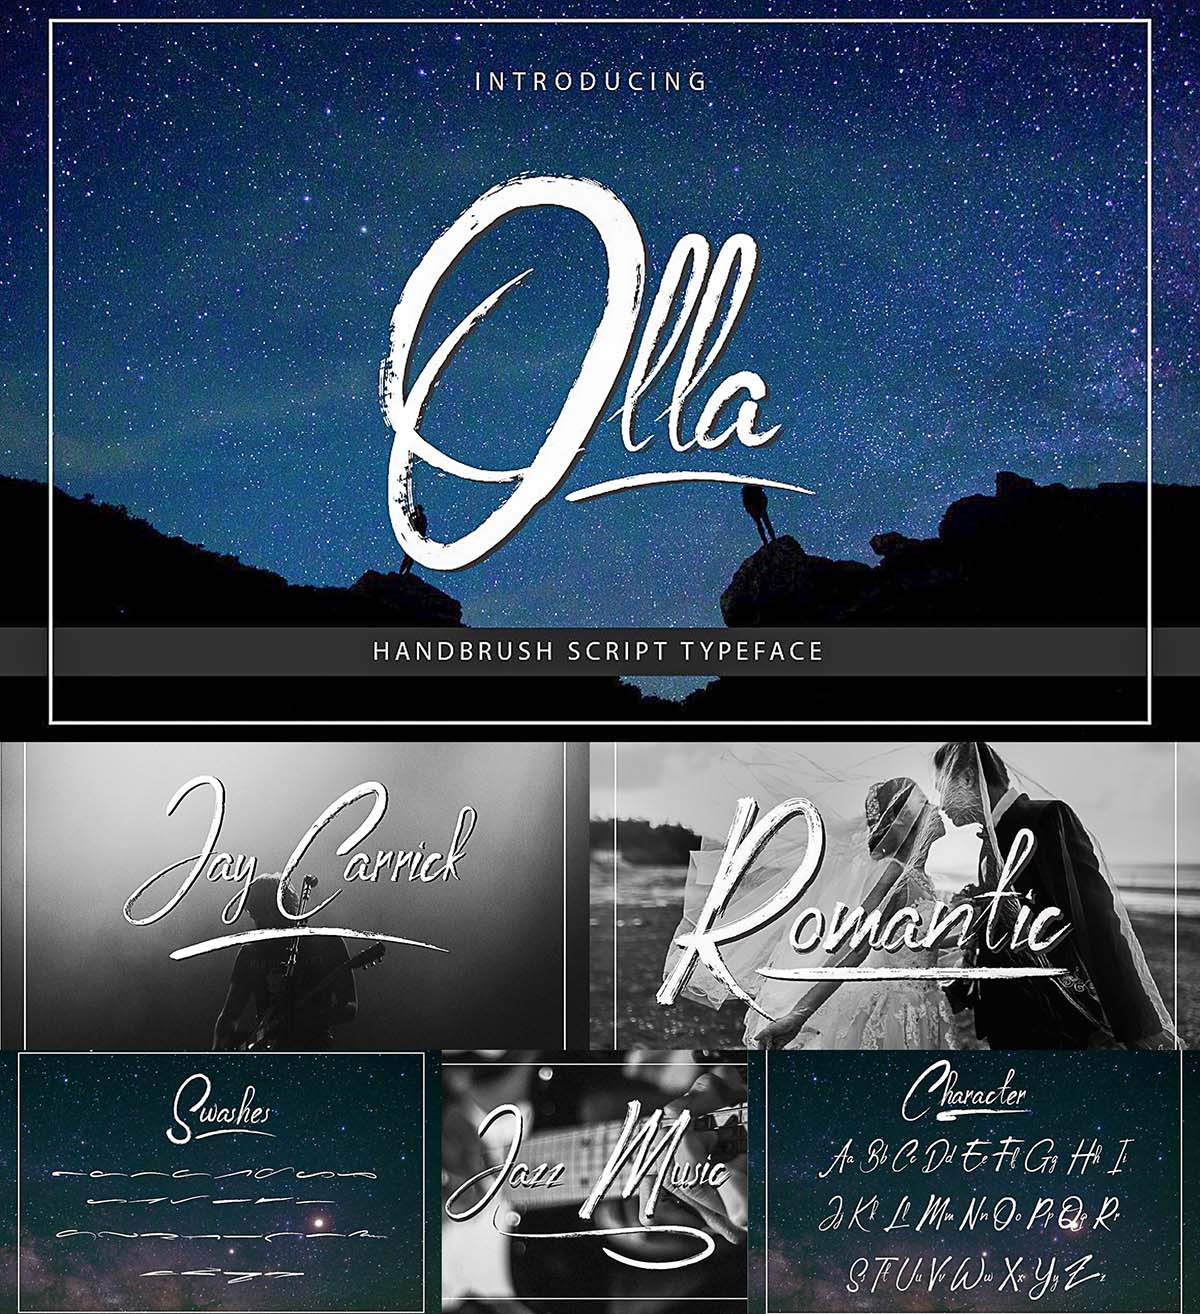 Olla script